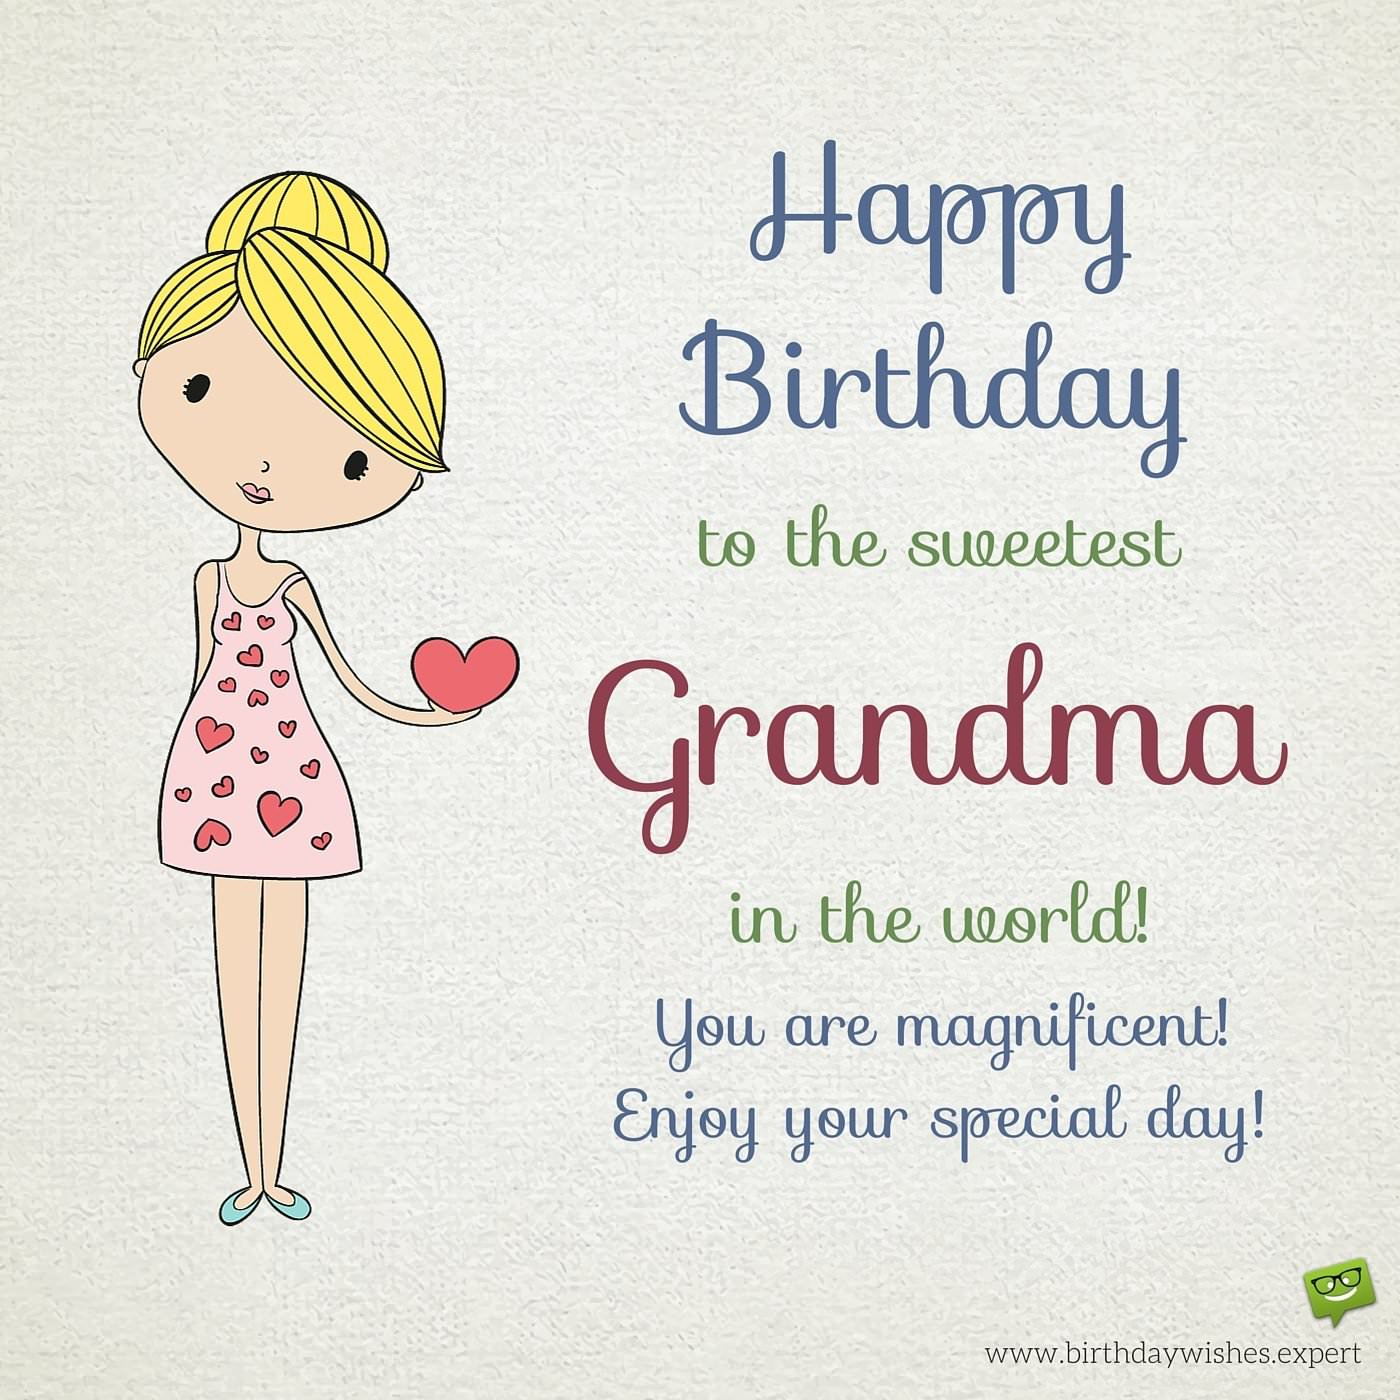 Happy Birthday Grandma Warm Wishes For Your Grandmother